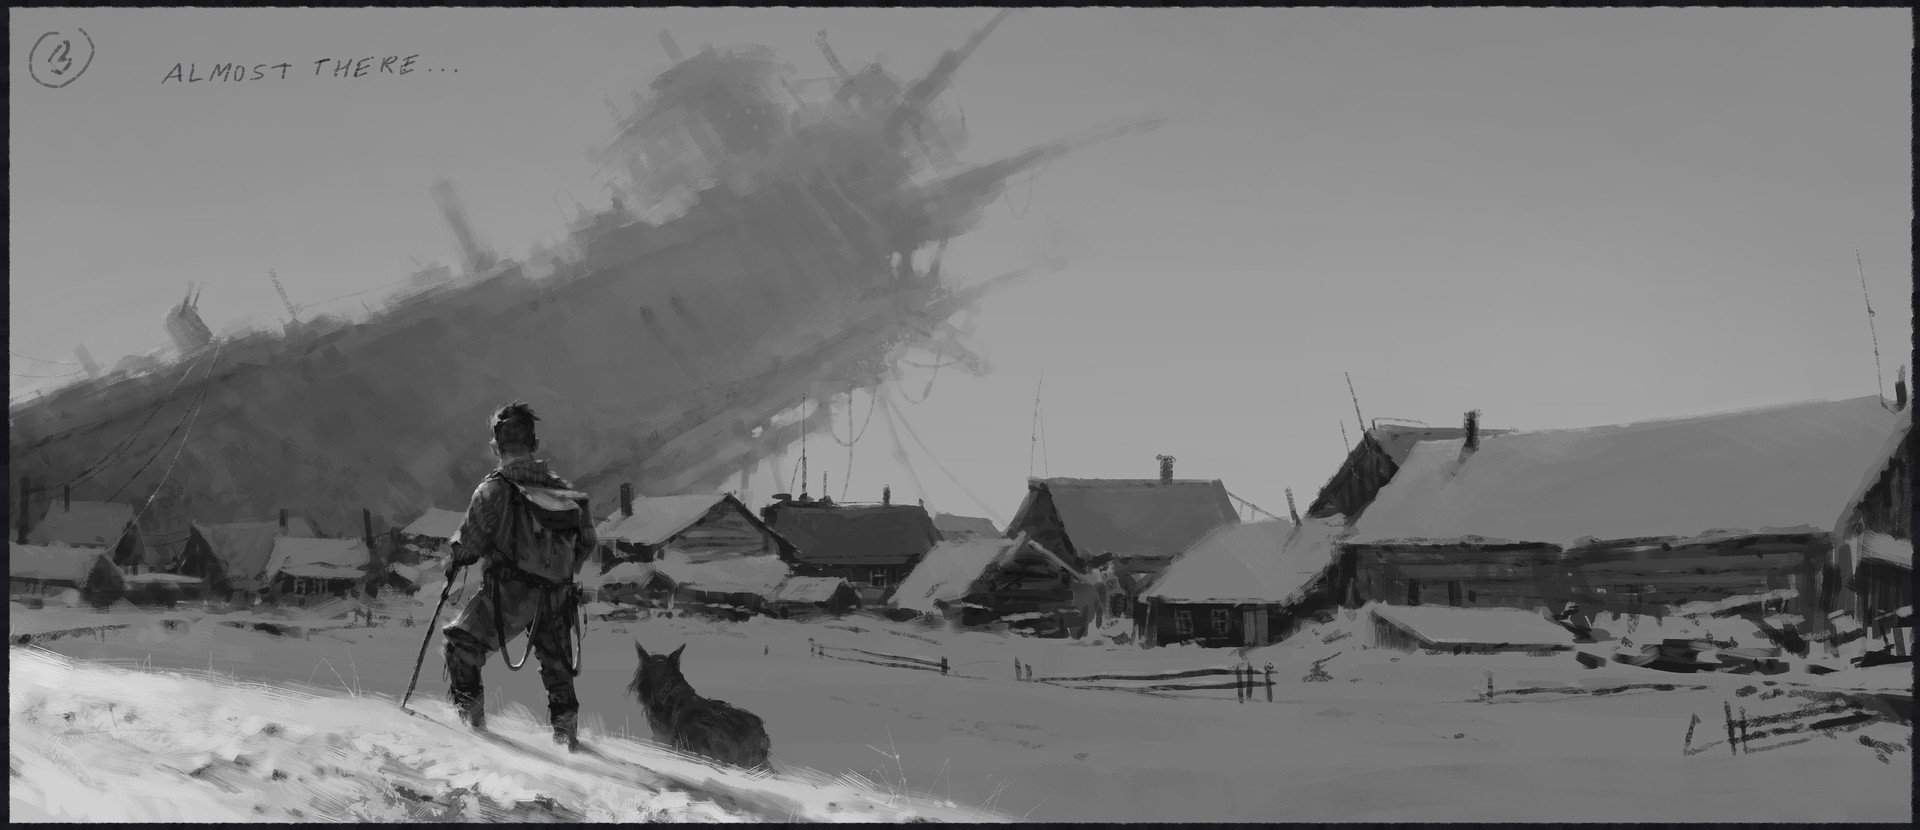 Jakub rozalski 1920 emergency landing process03